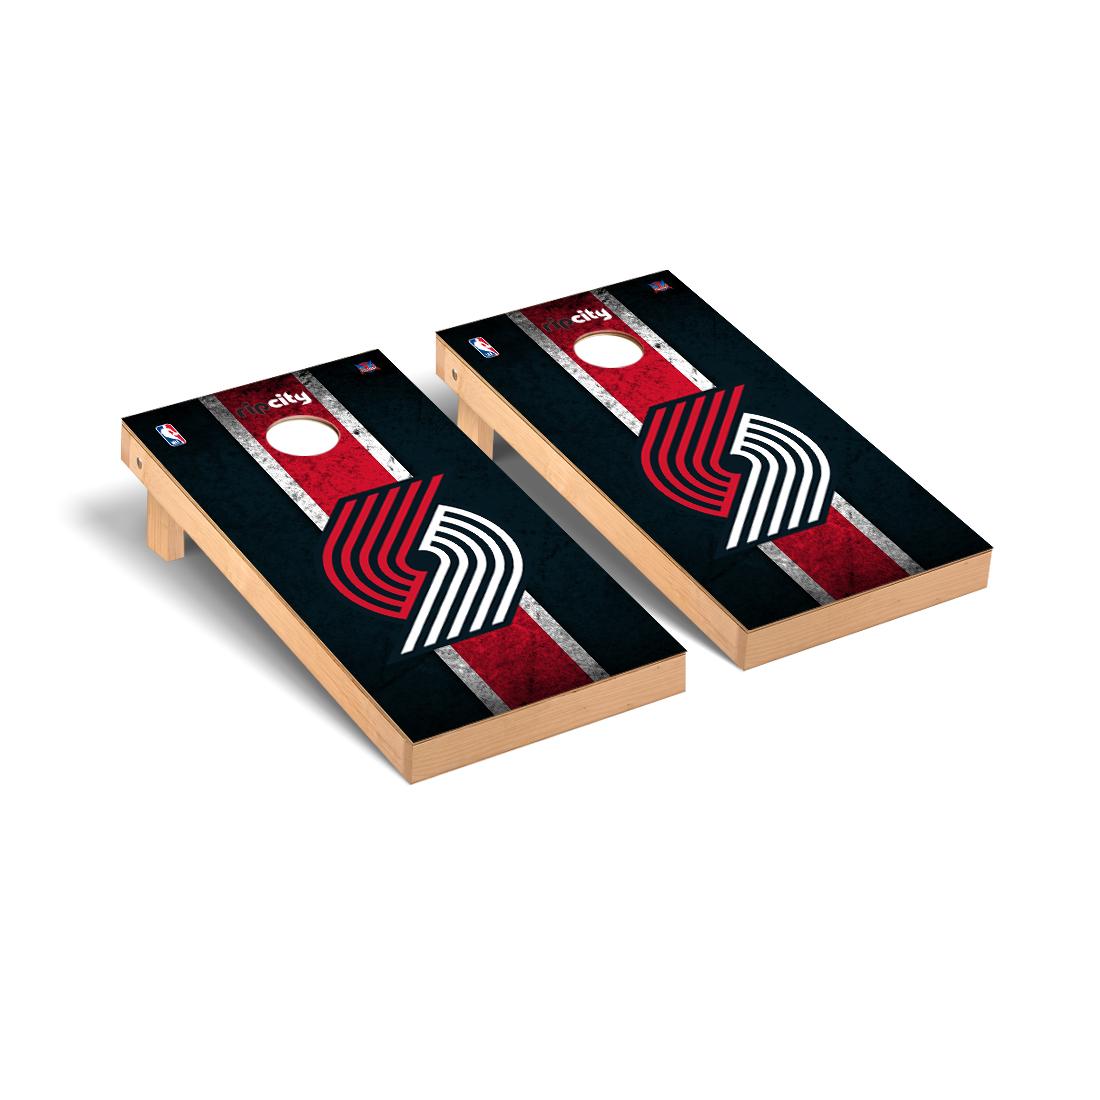 Portland Blazers Trailblazers NBA Basketball Cornhole Game Set Vintage Version